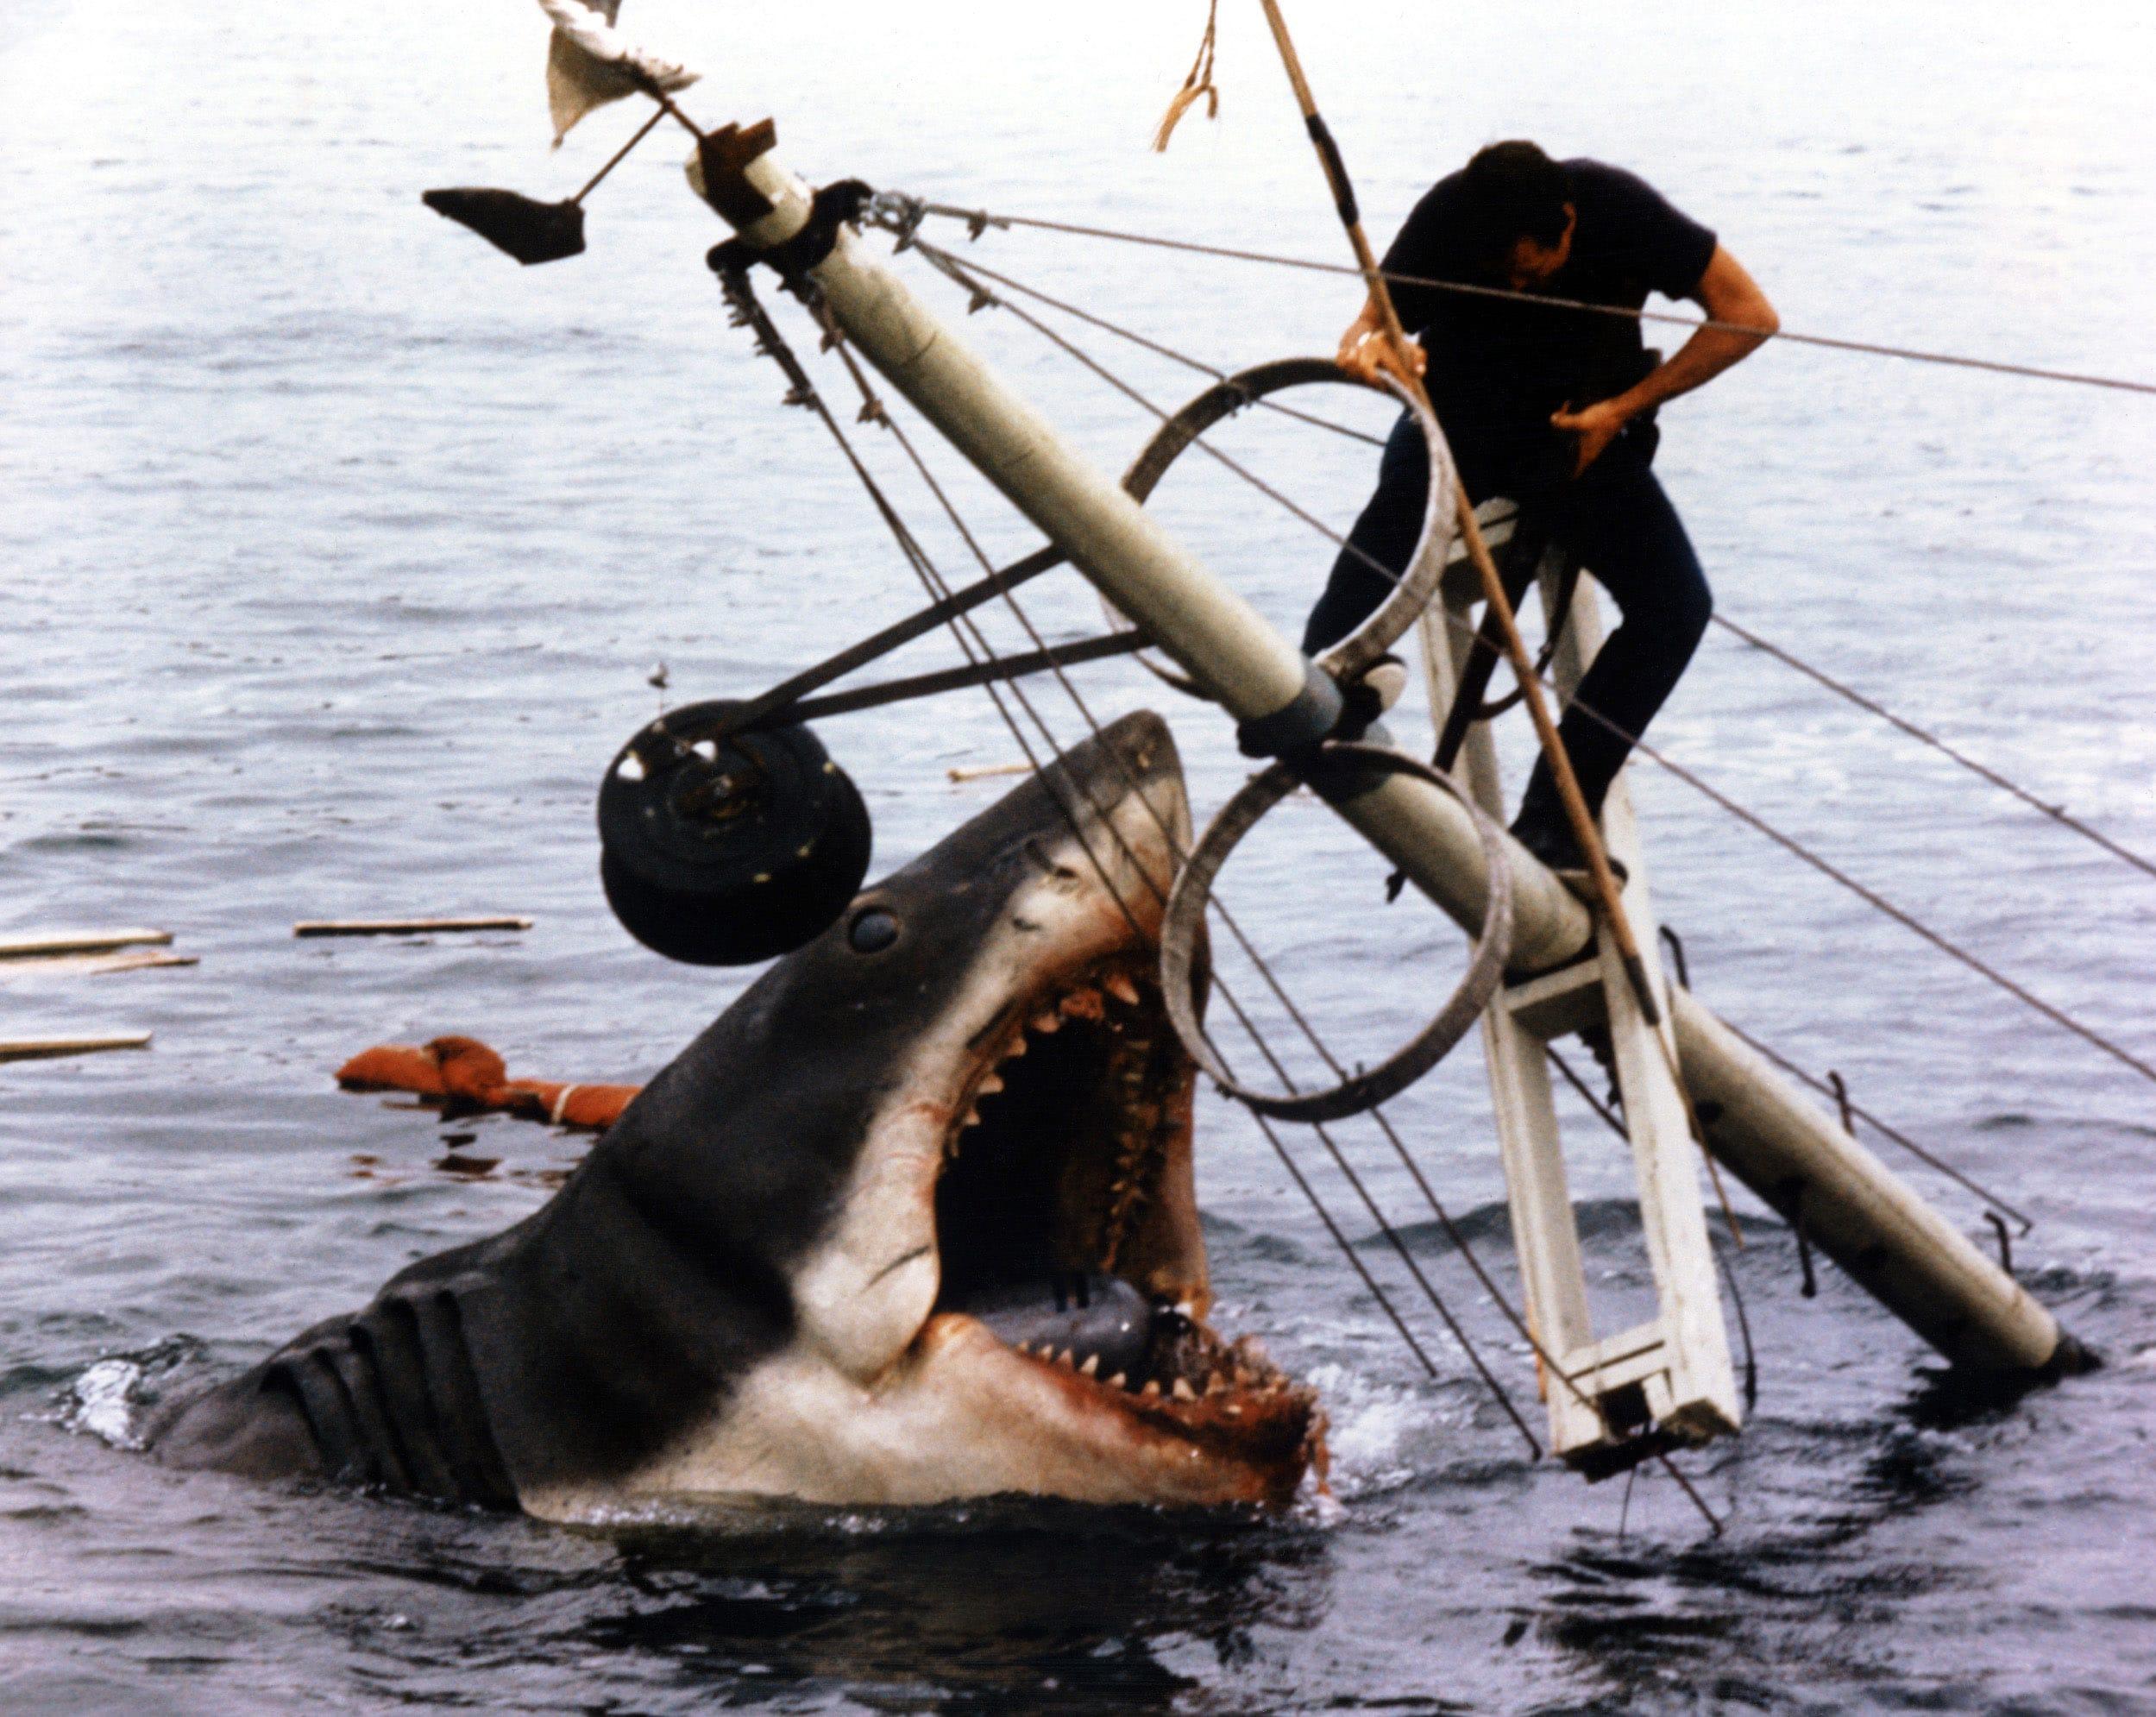 JAWS, 1975 shark